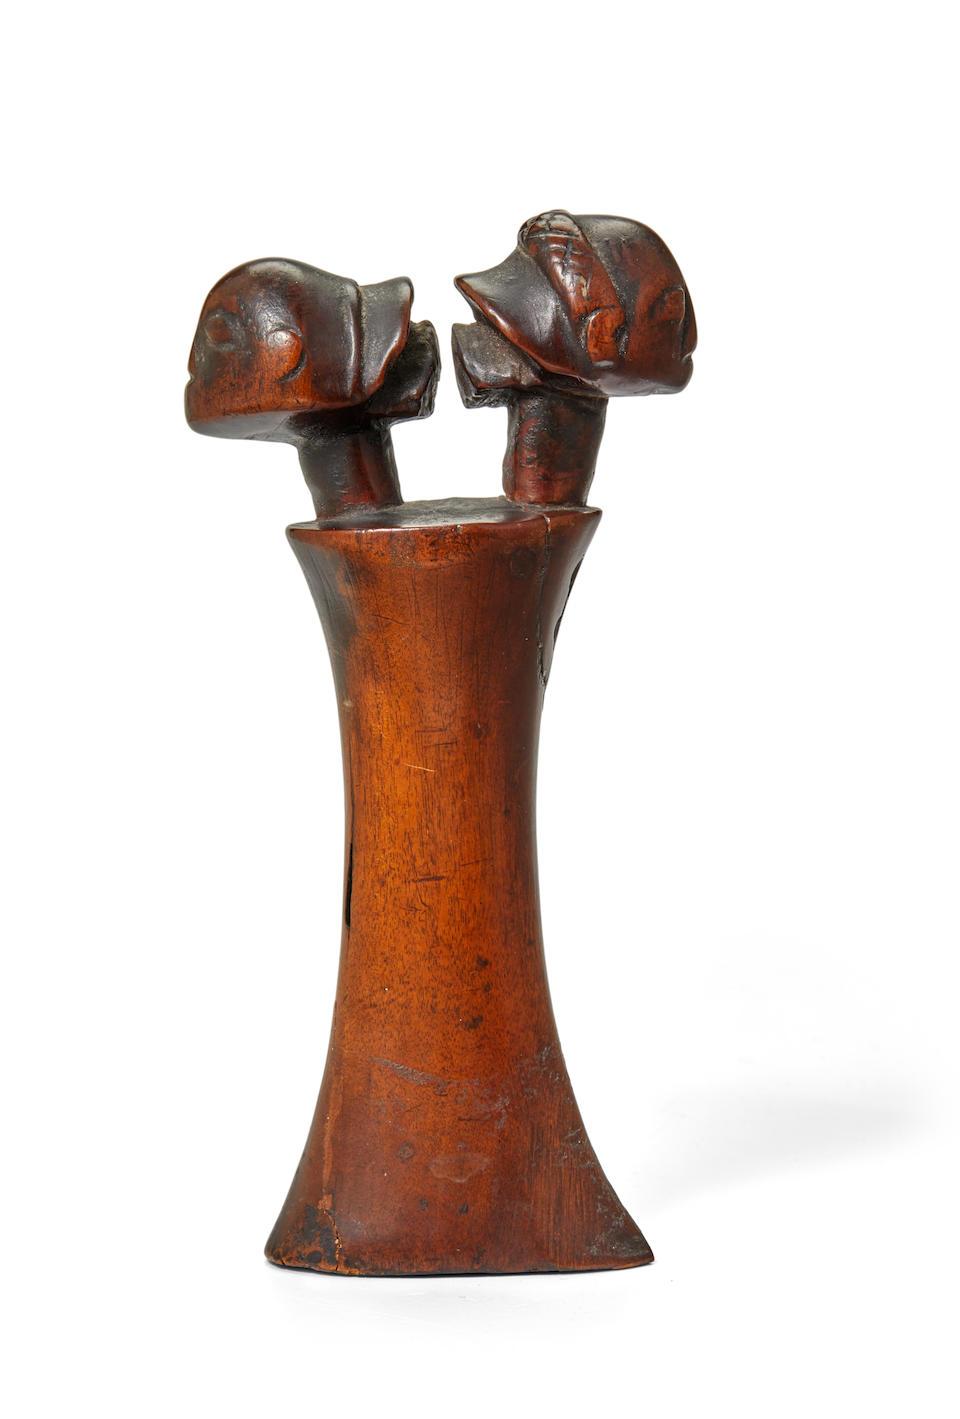 Luba Shankadi Knife Handle, Democratic Republic of the Congo